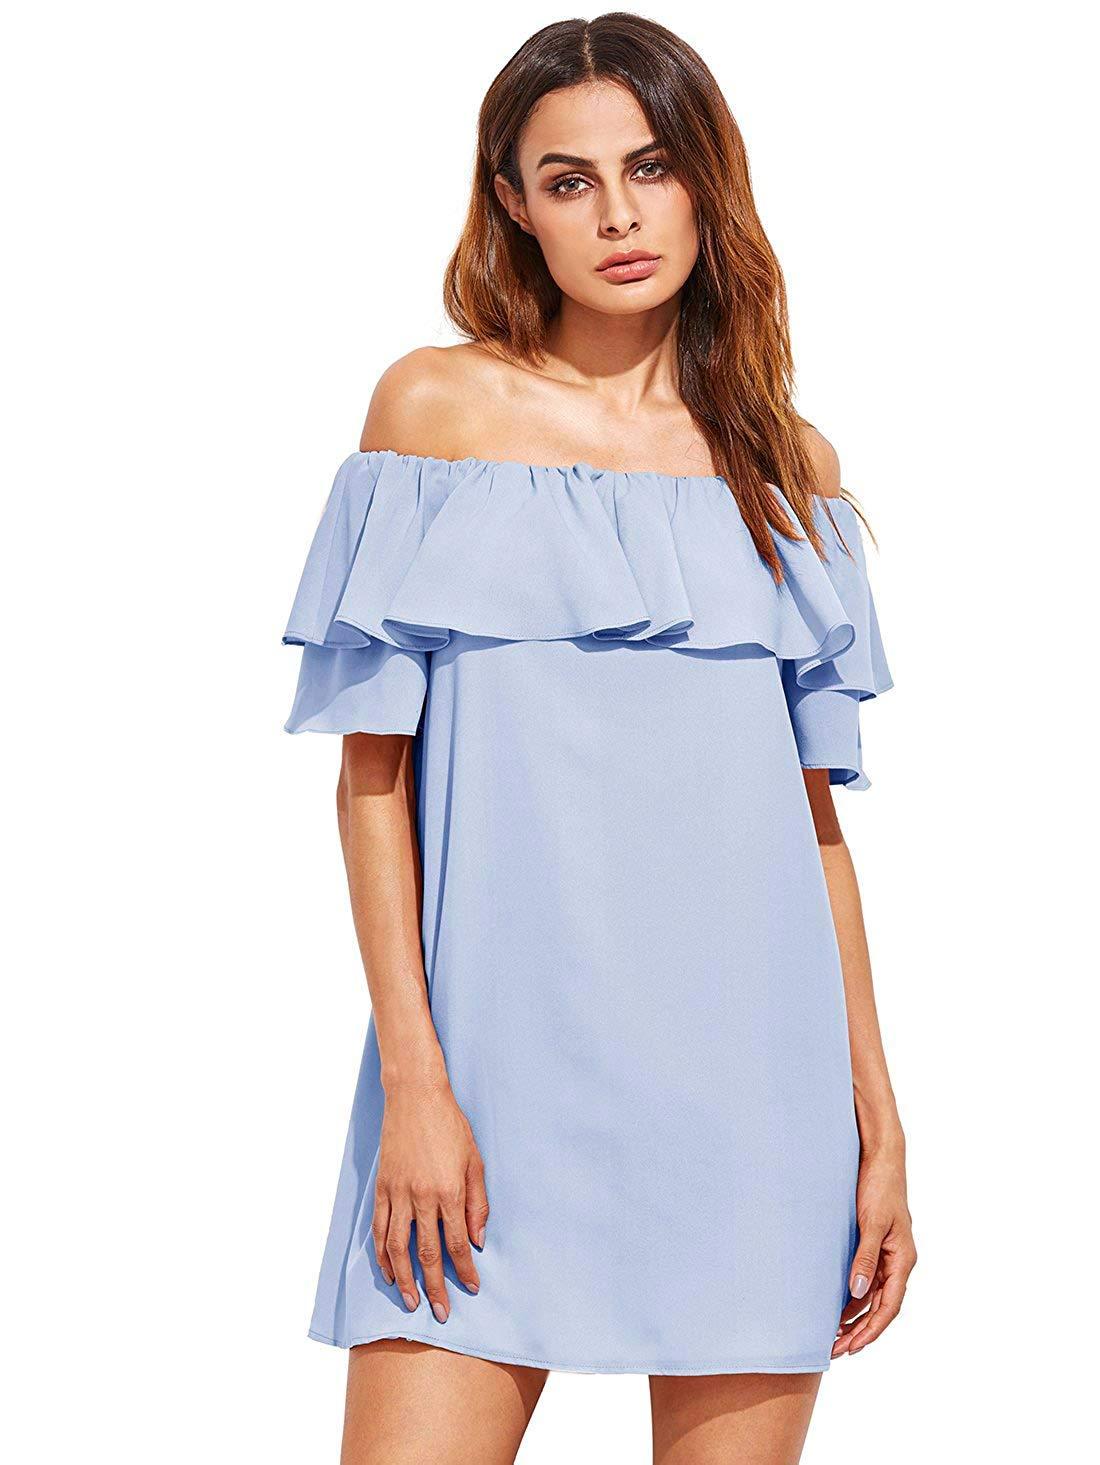 Available at Amazon: Milumia Women's Off Shoulder Ruffles Shift Loose Mini Dress